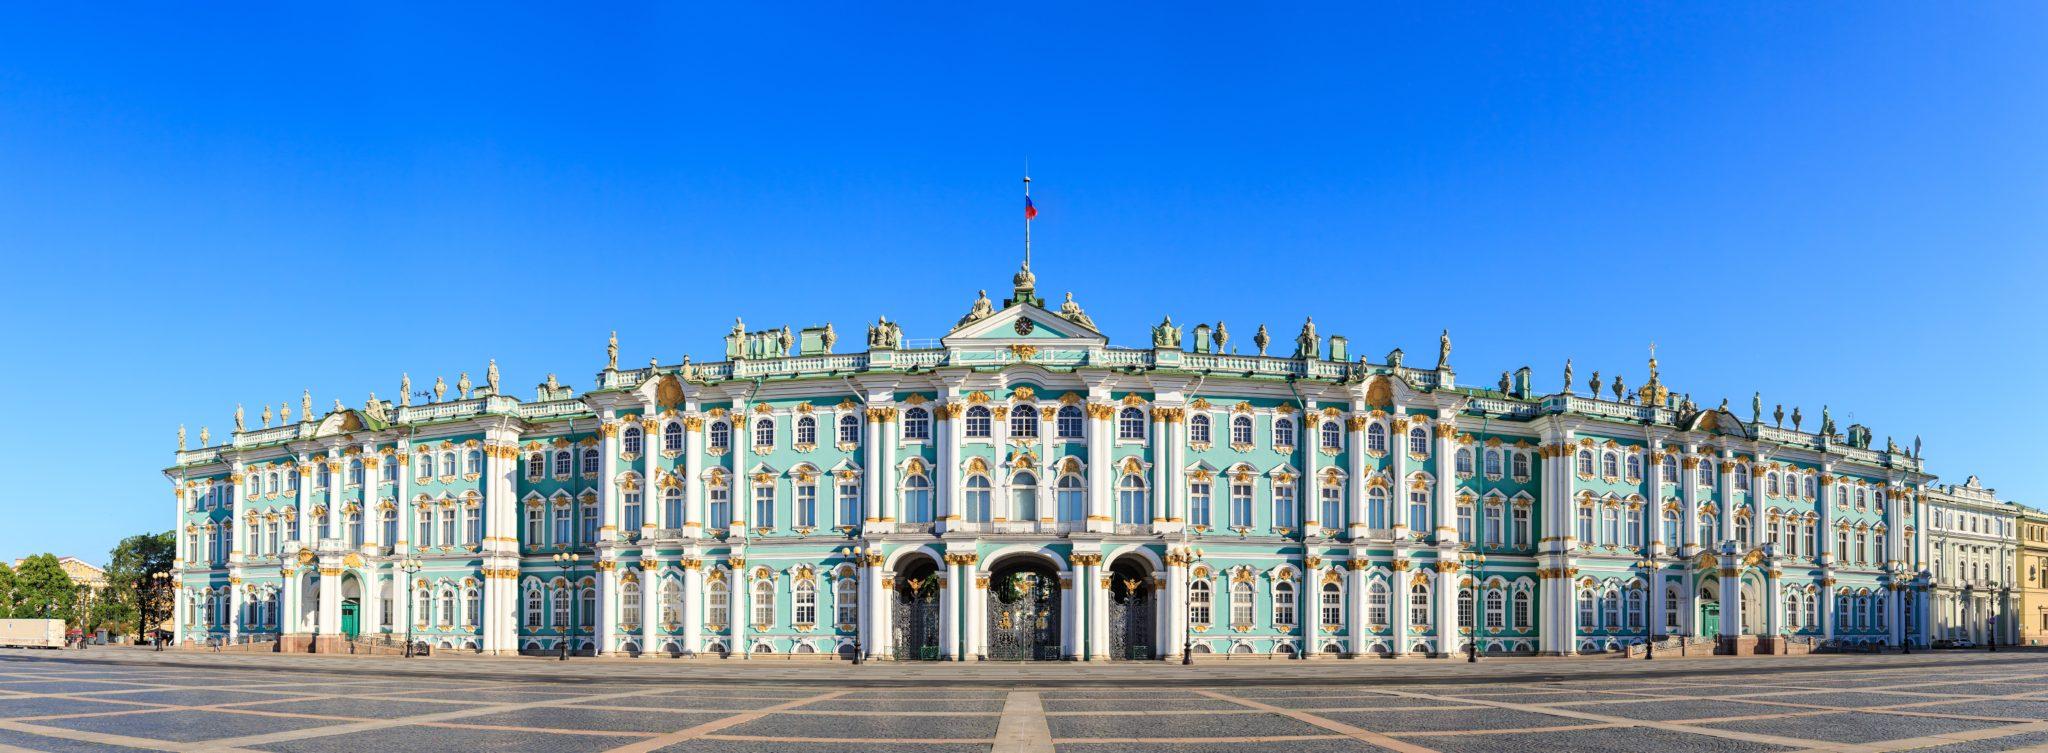 St. Petersburg Ermitaż